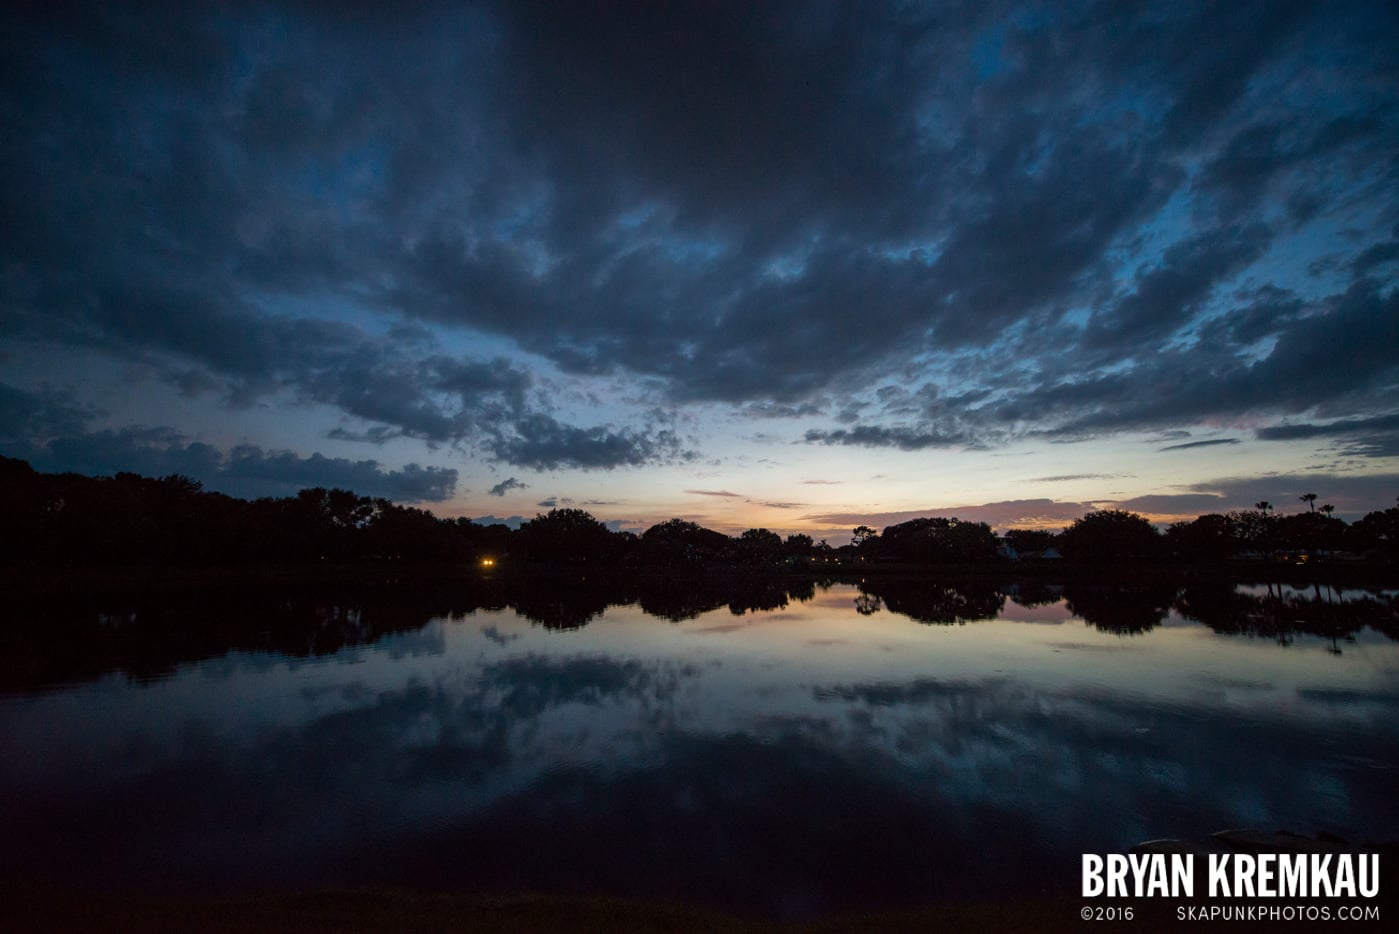 Sunsets, Astrophotography & Birds @ Venice, Florida - 10.25.14 - 11.5.14 (1)